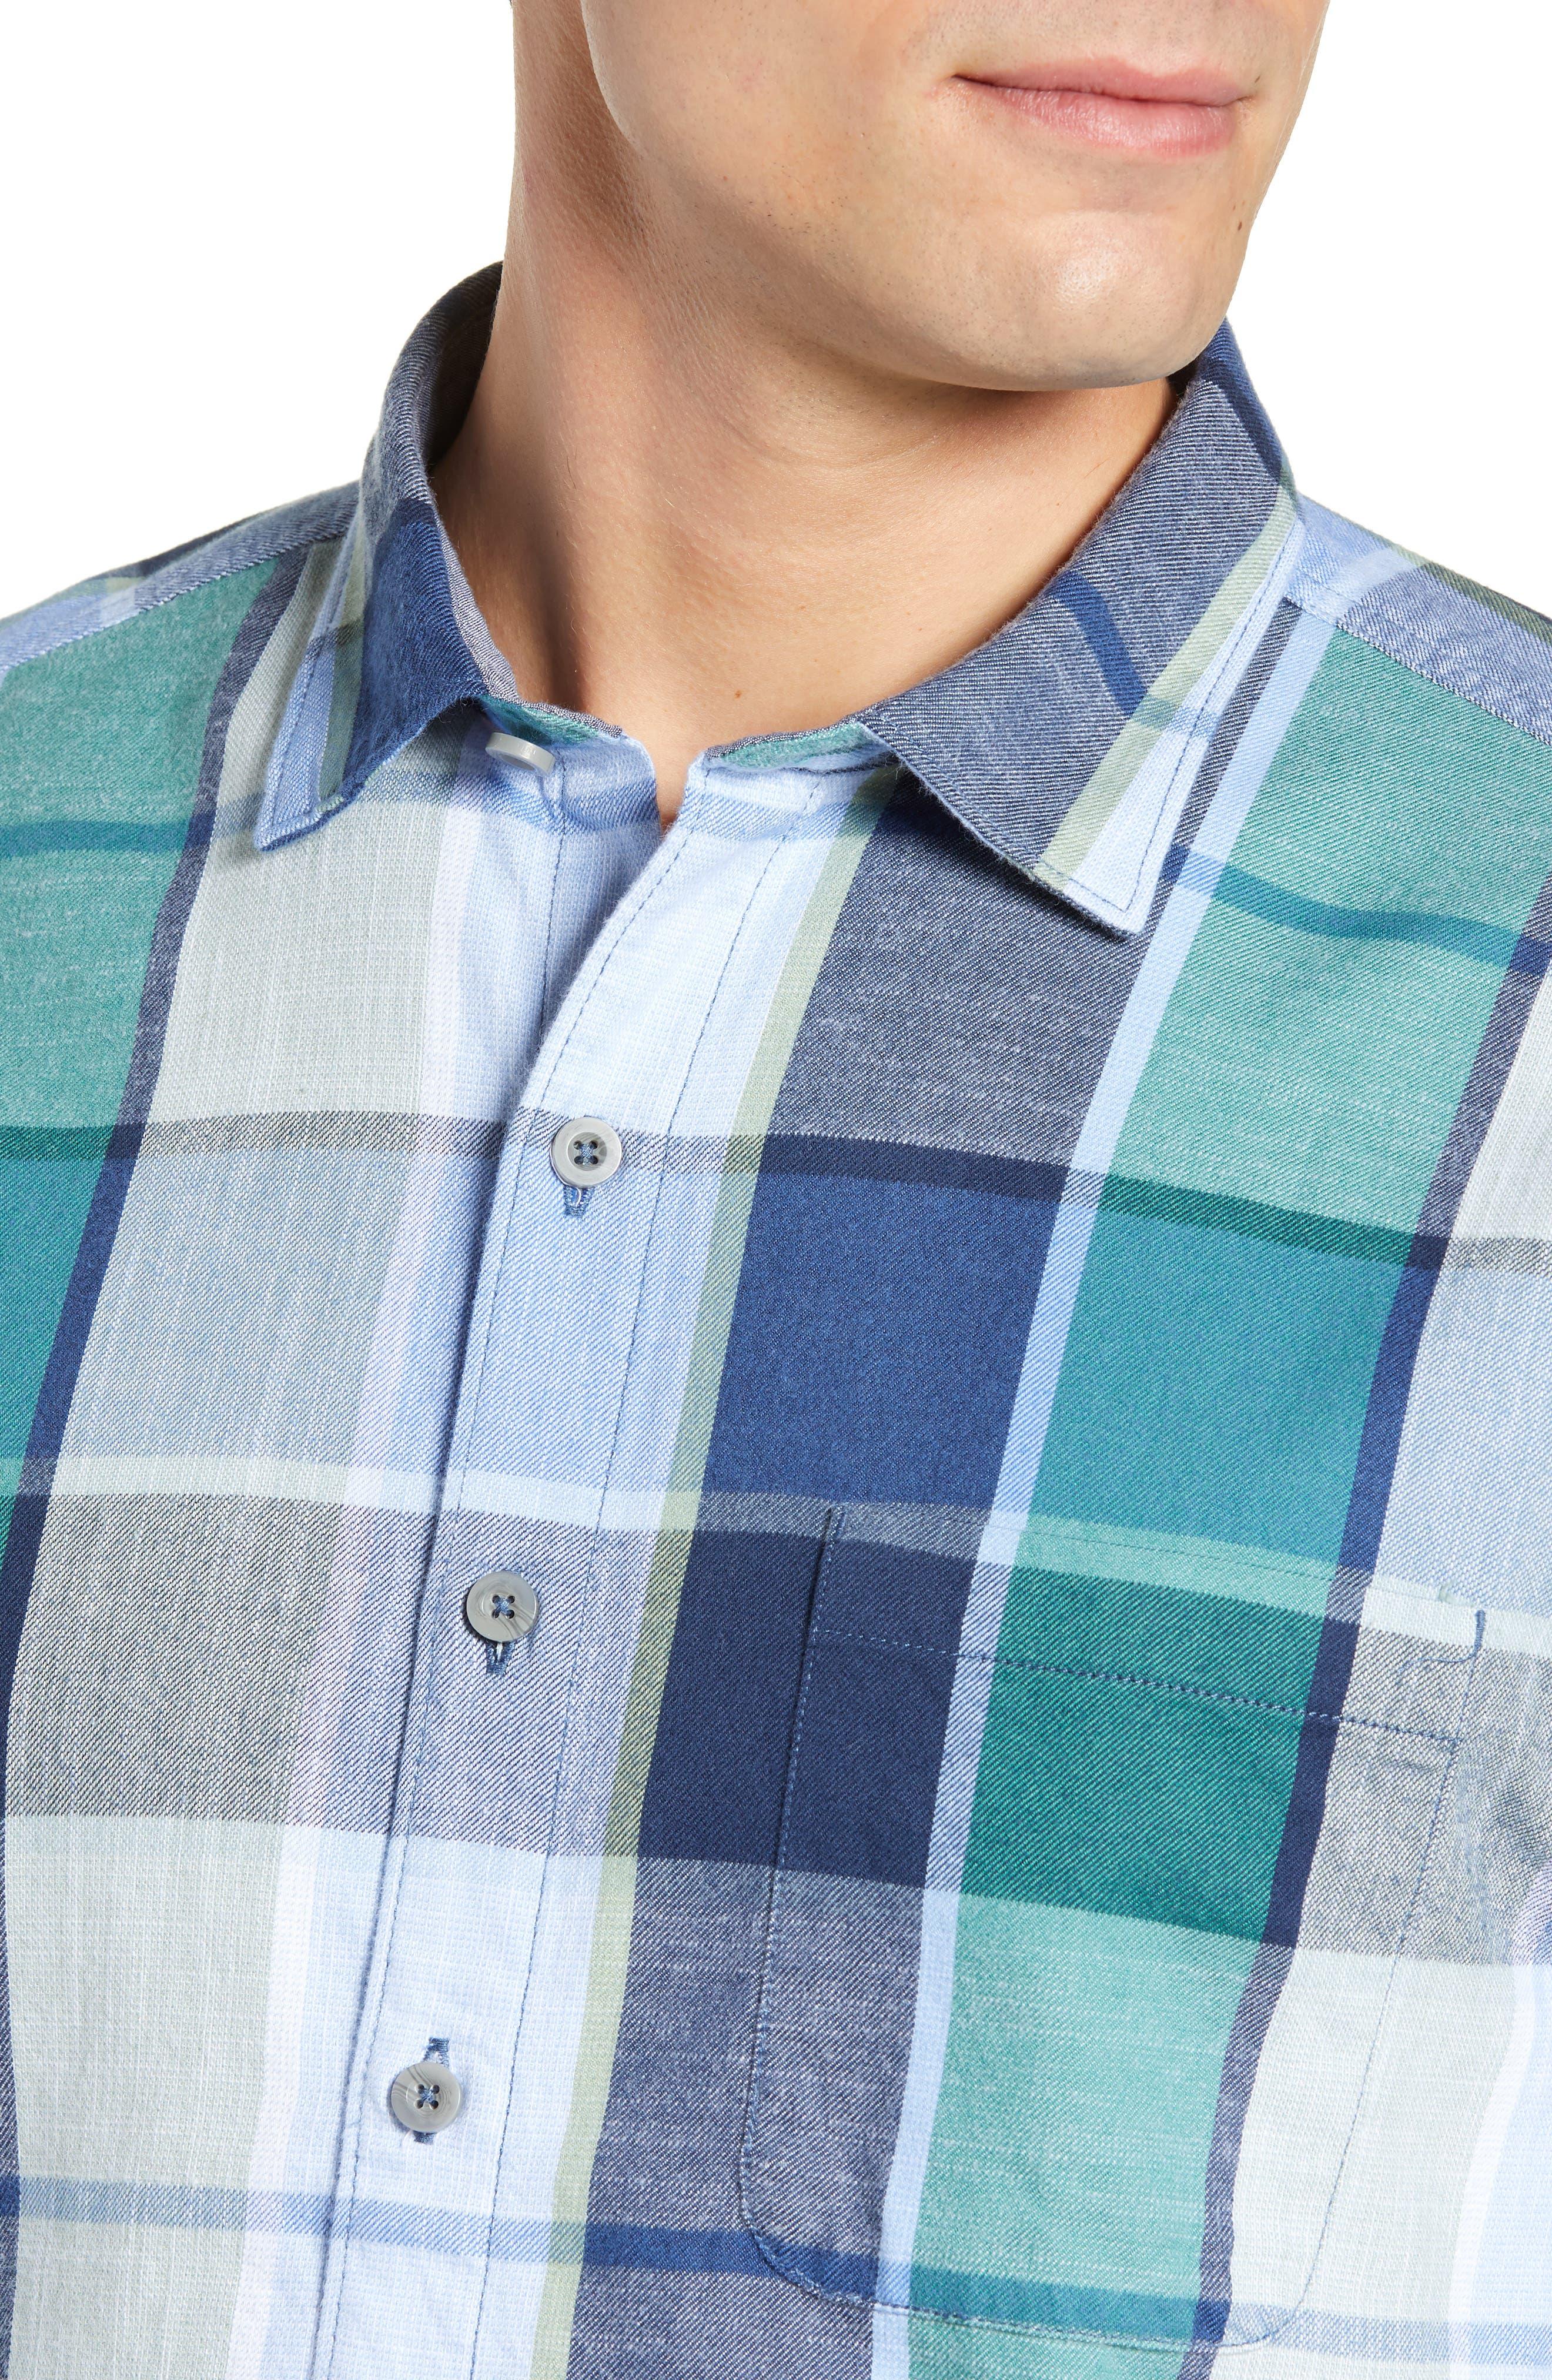 Heredia Plaid Sport Shirt,                             Alternate thumbnail 2, color,                             ZEPHYR BLUE